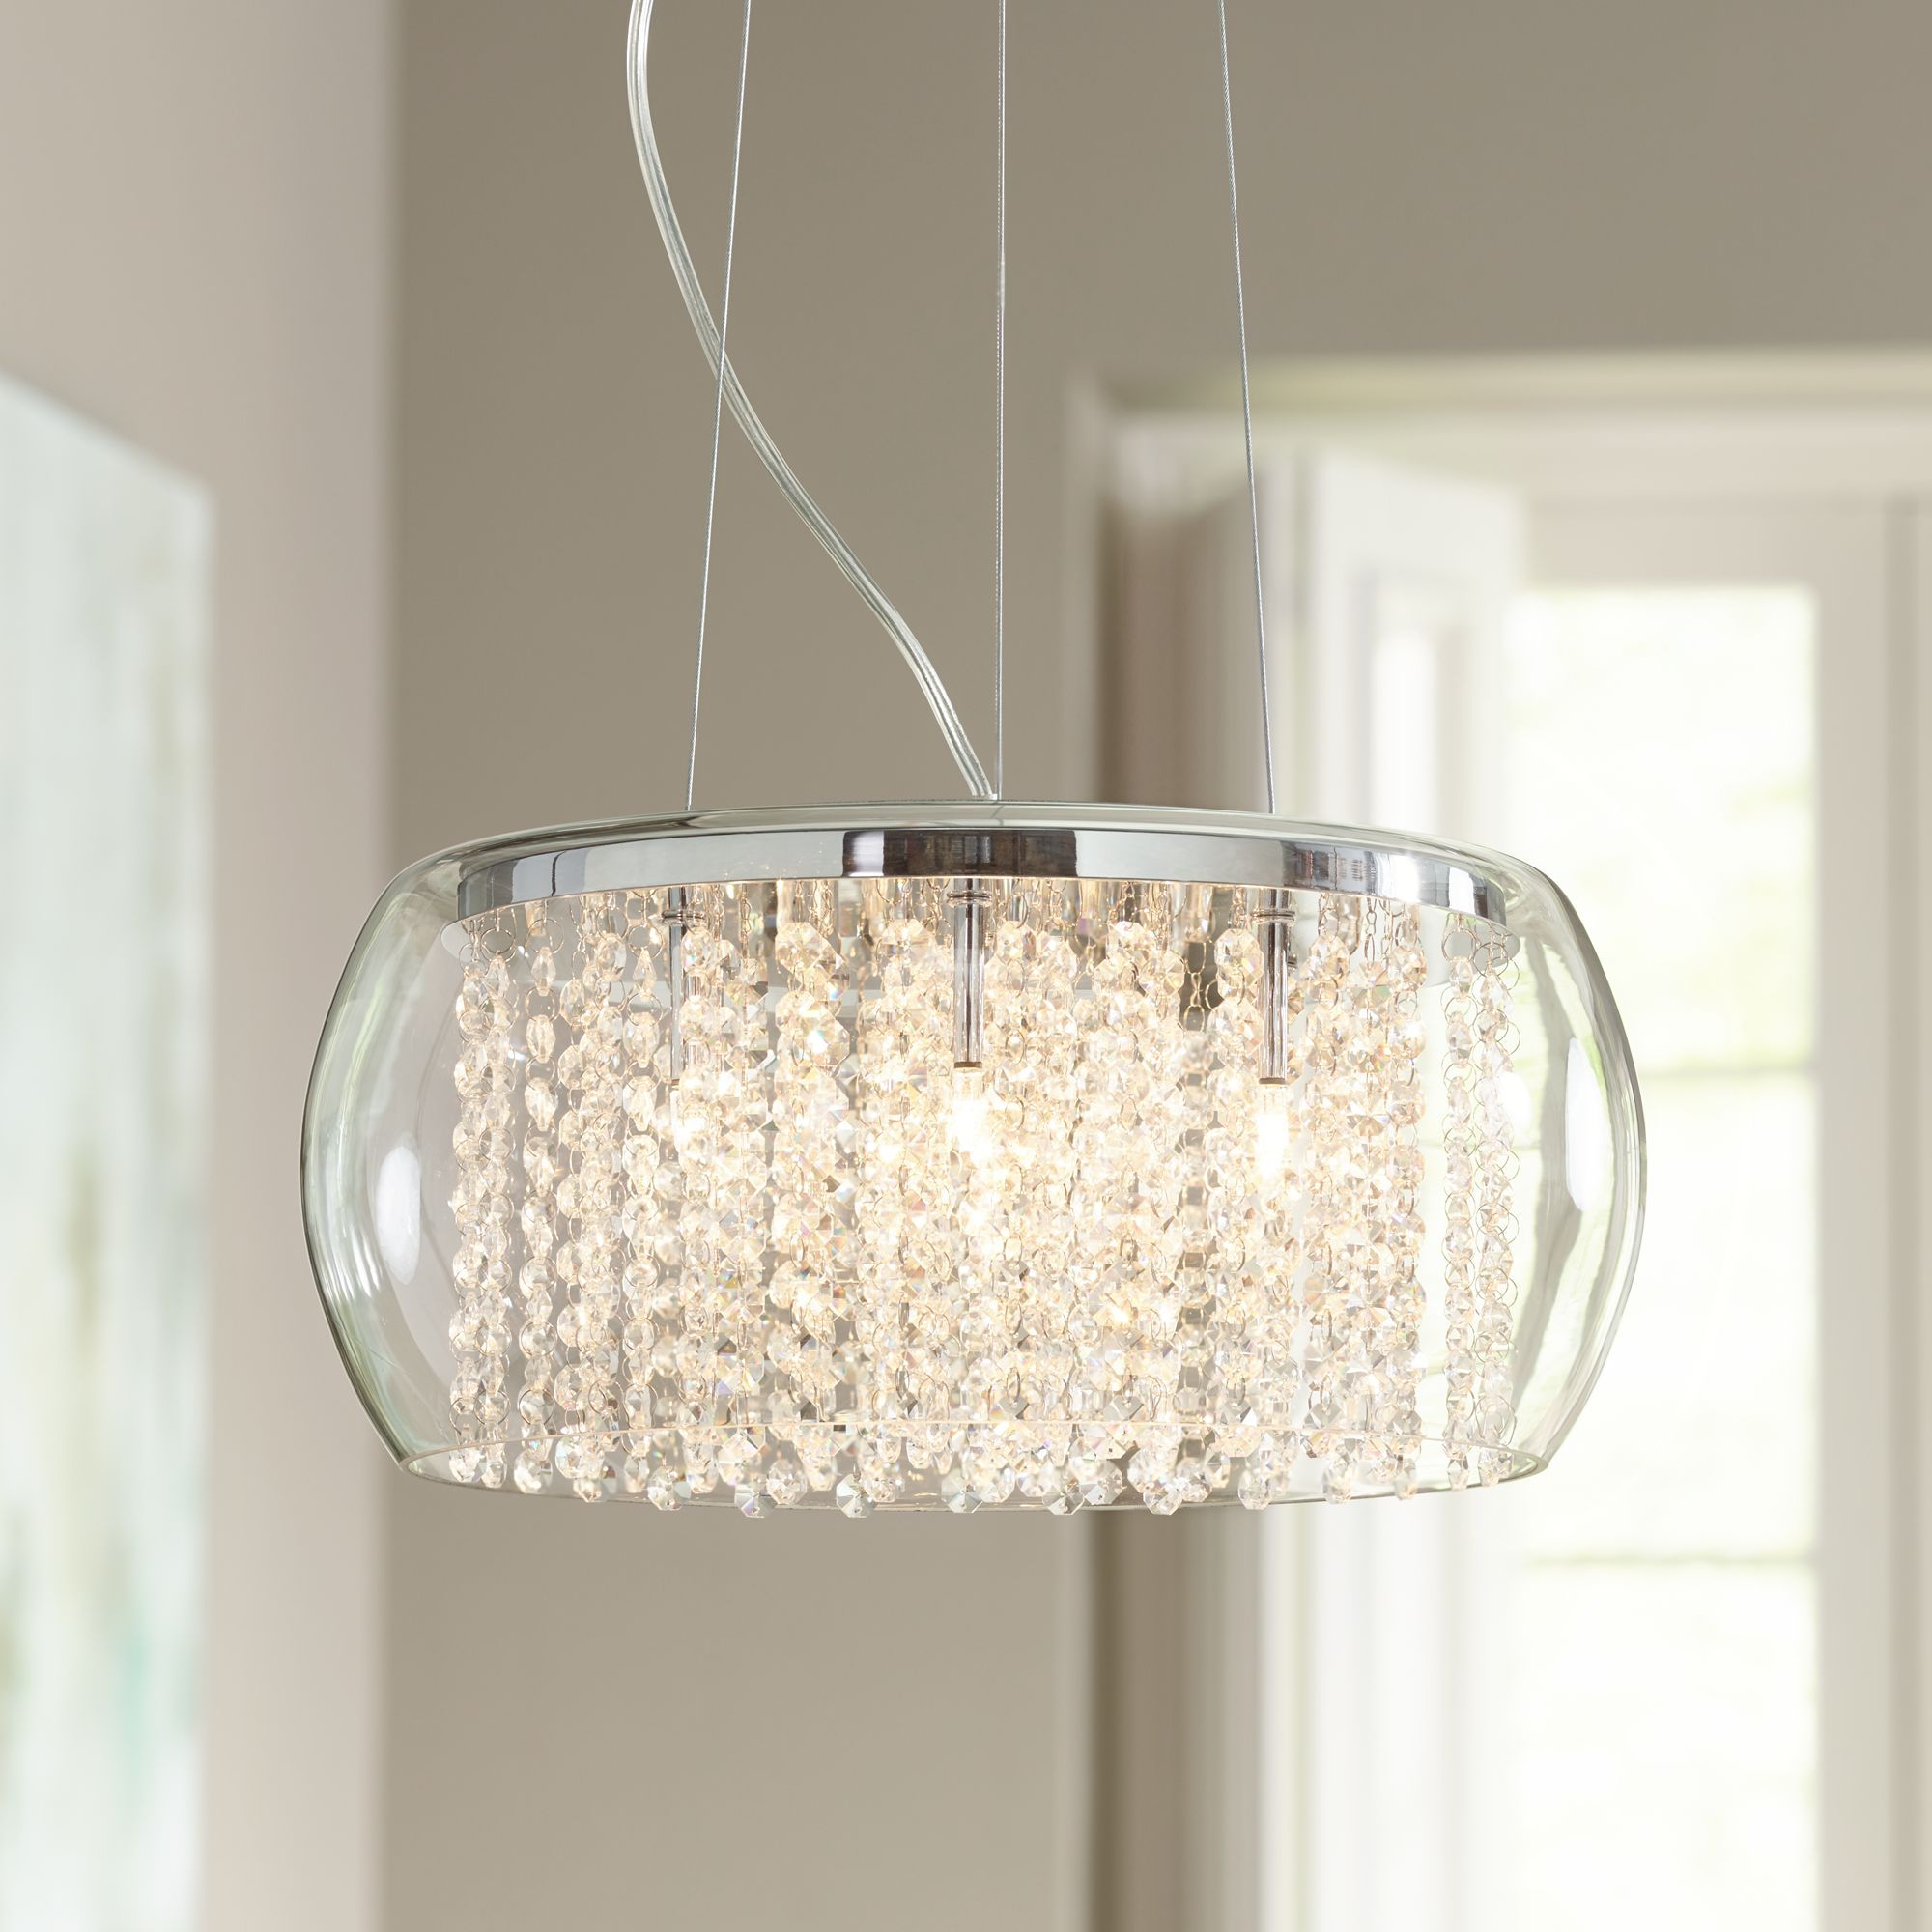 Possini Euro Design Rainfall Glass Drum Crystal Chandelier